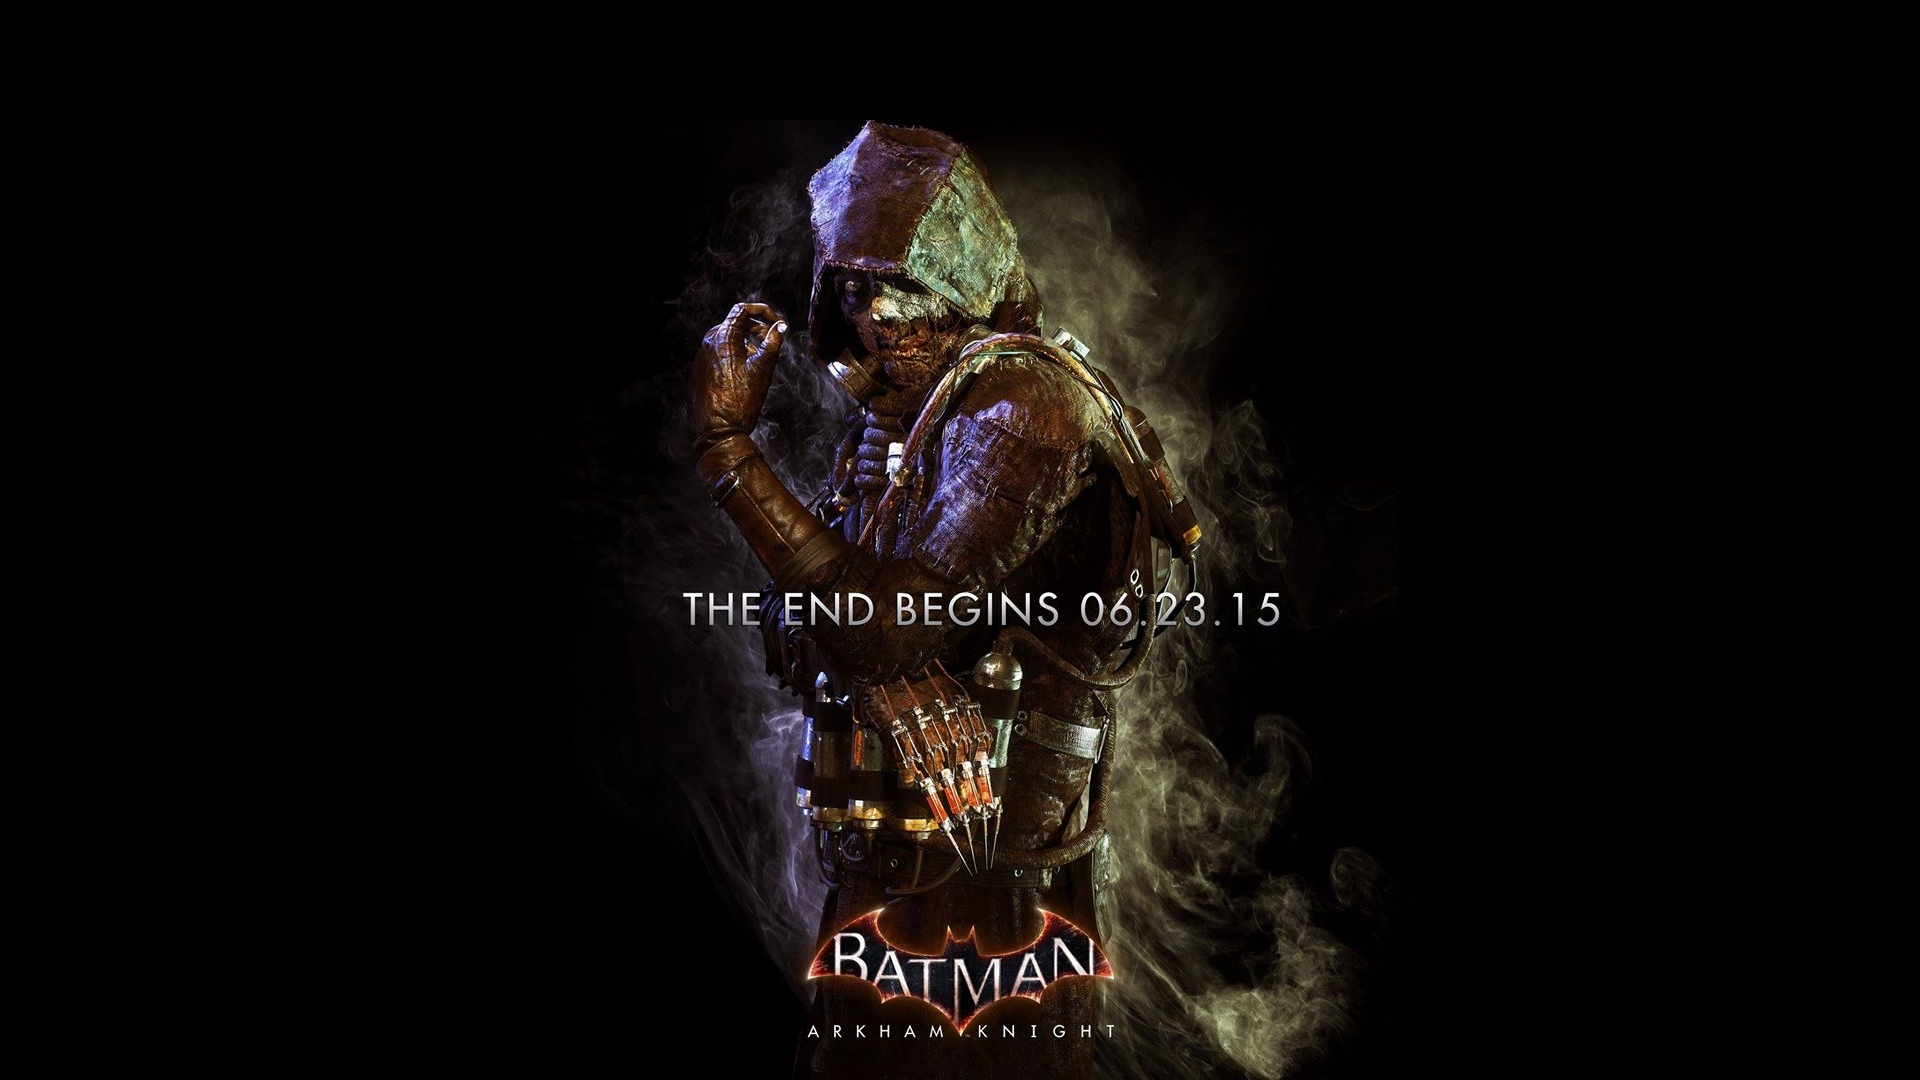 Batman Arkham Knight Scarecrow Poster Wallpaper 1920x1080